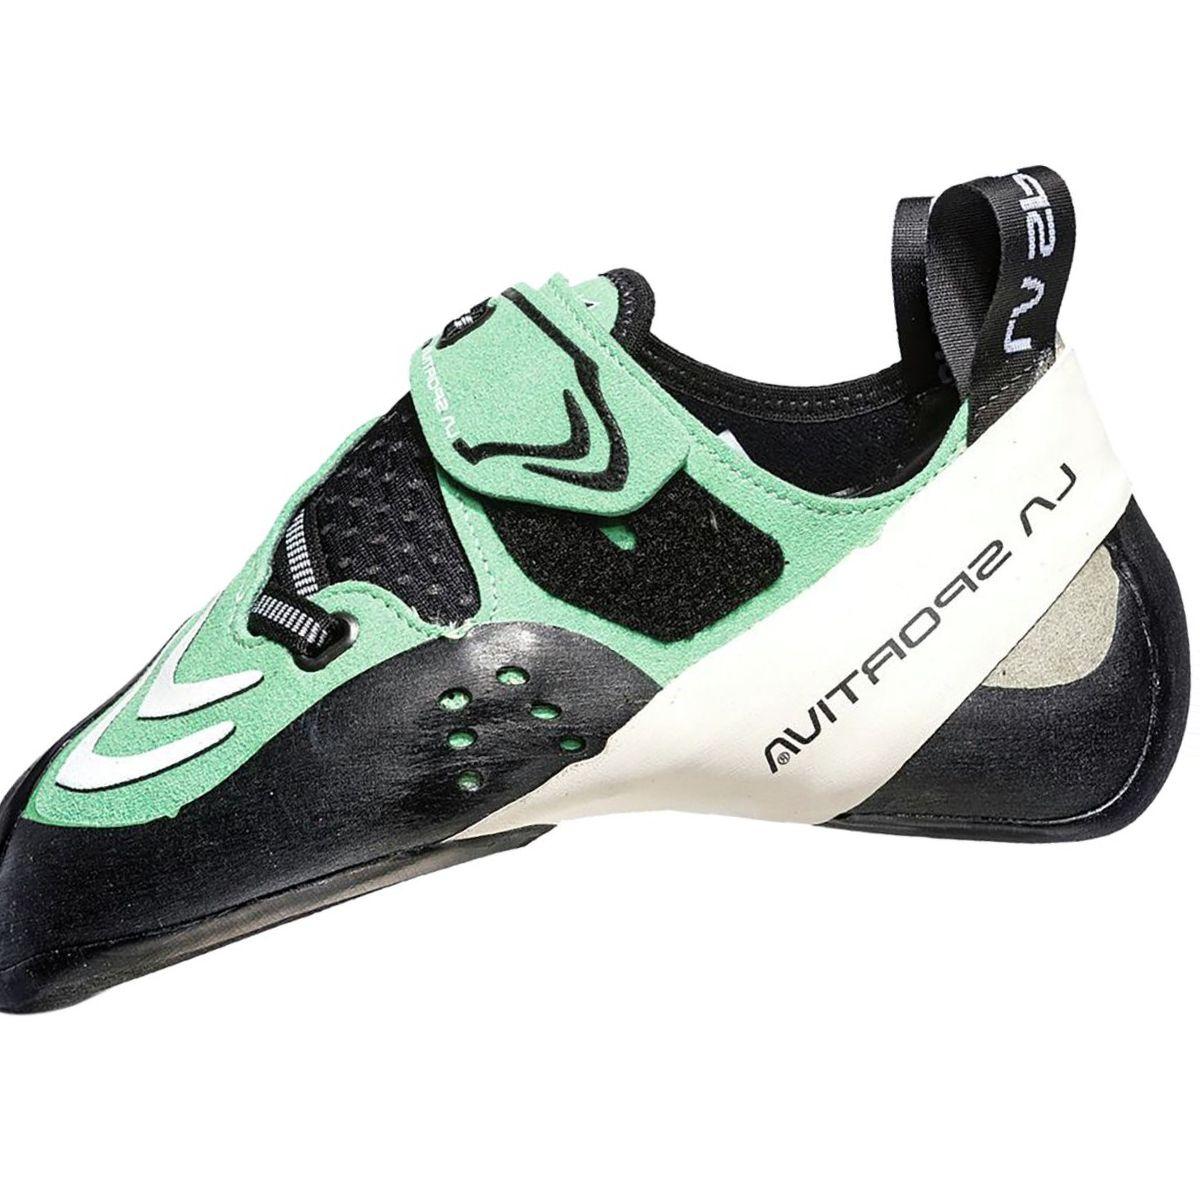 La Sportiva Futura Climbing Shoe - Women's